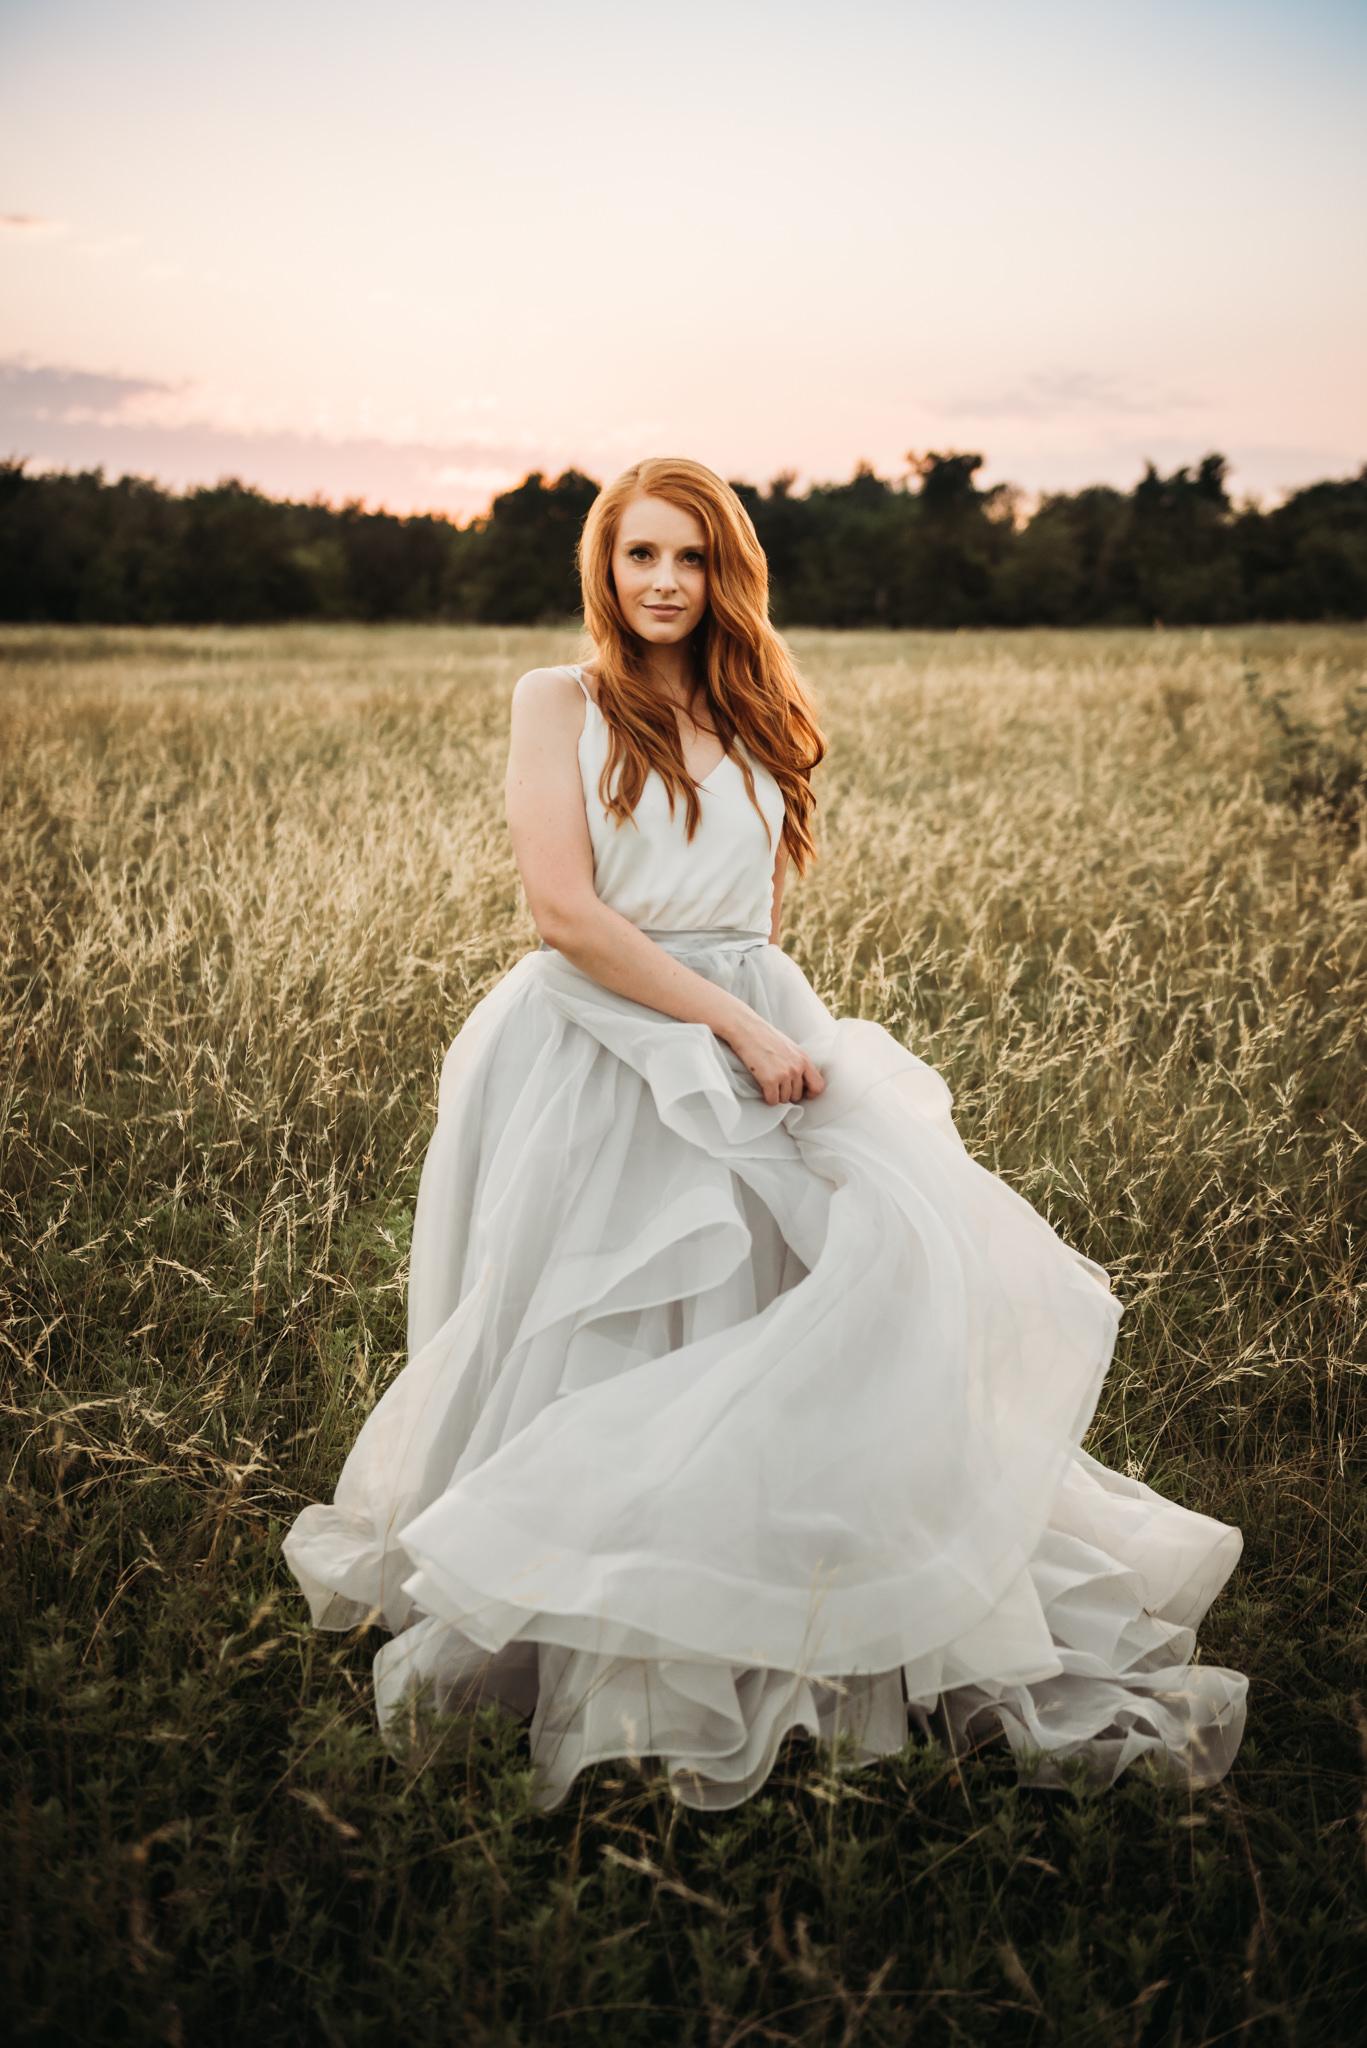 jamie denholm photography